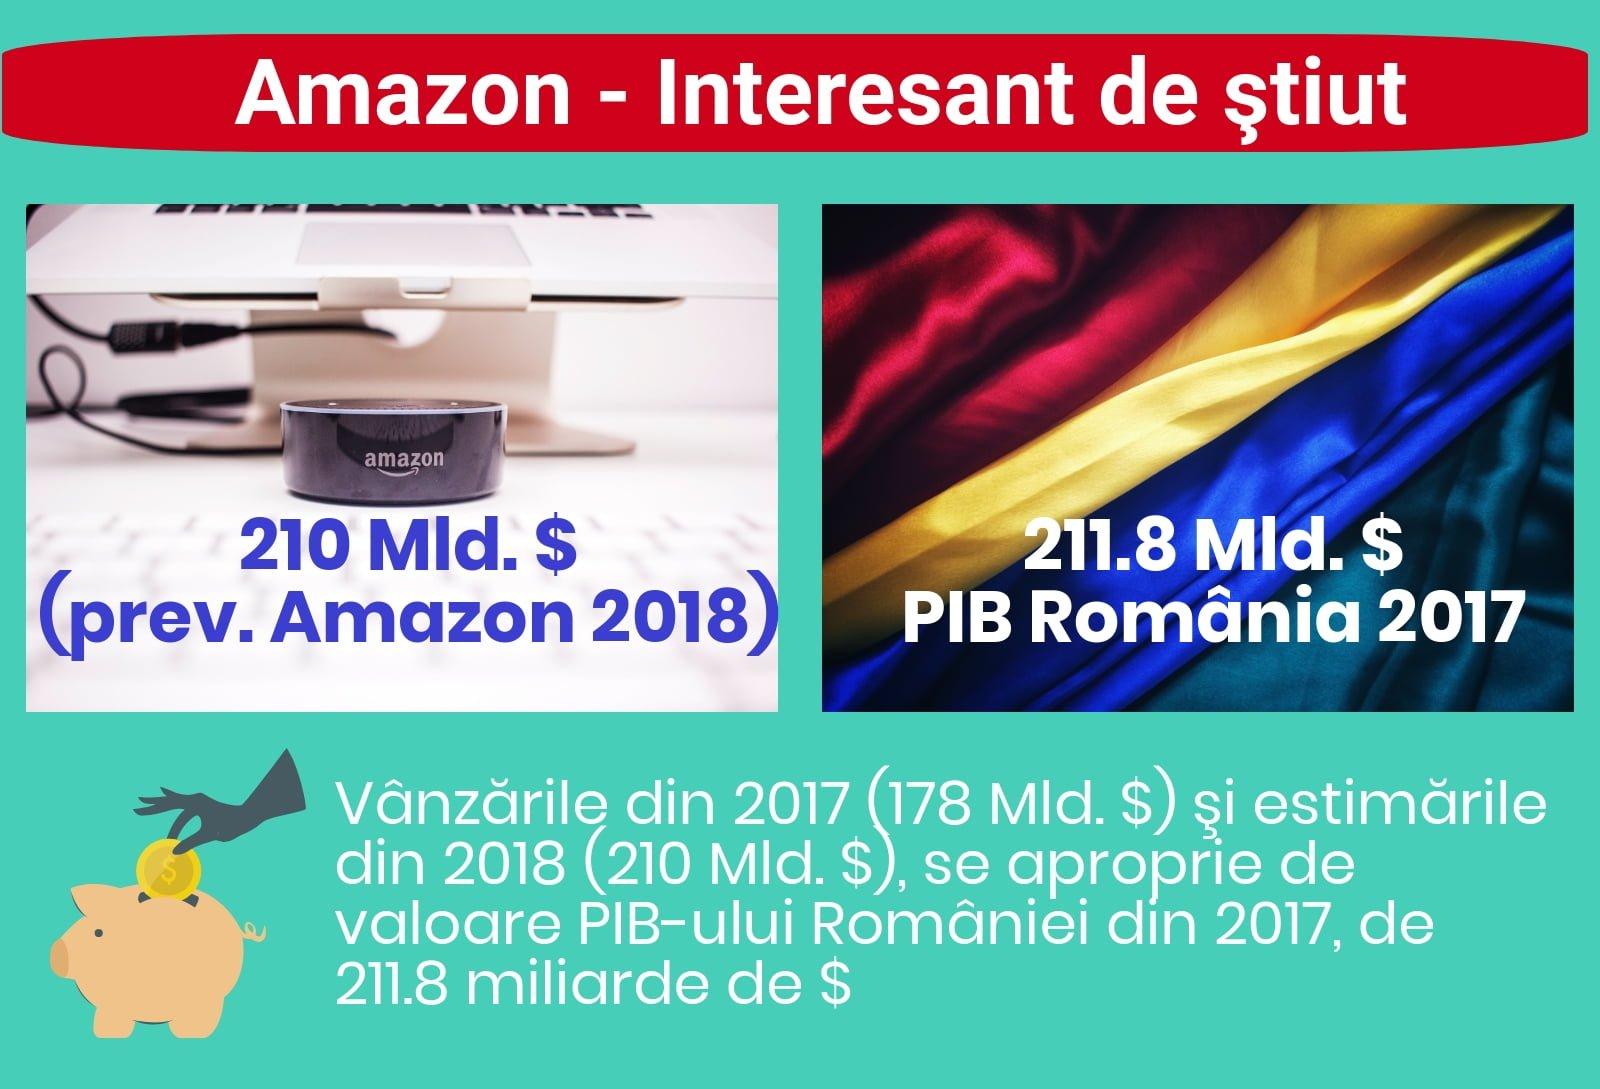 Amazonepedia - PIB Romania + Cifra afaceri Amazon